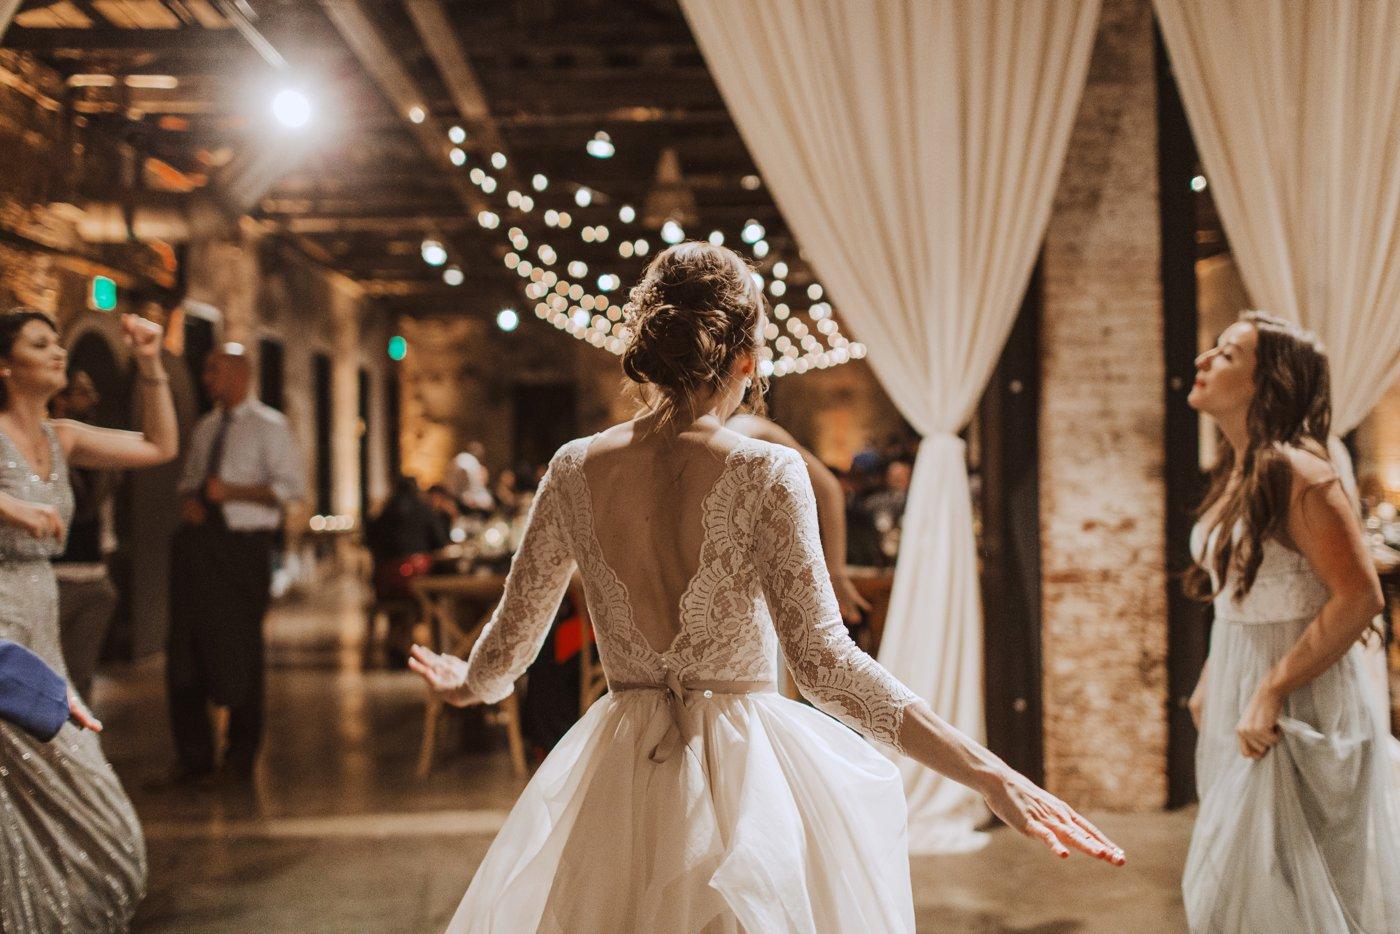 wedding reception bistro lights Mt. Washington Mill Dye House Baltimore wedding photographer